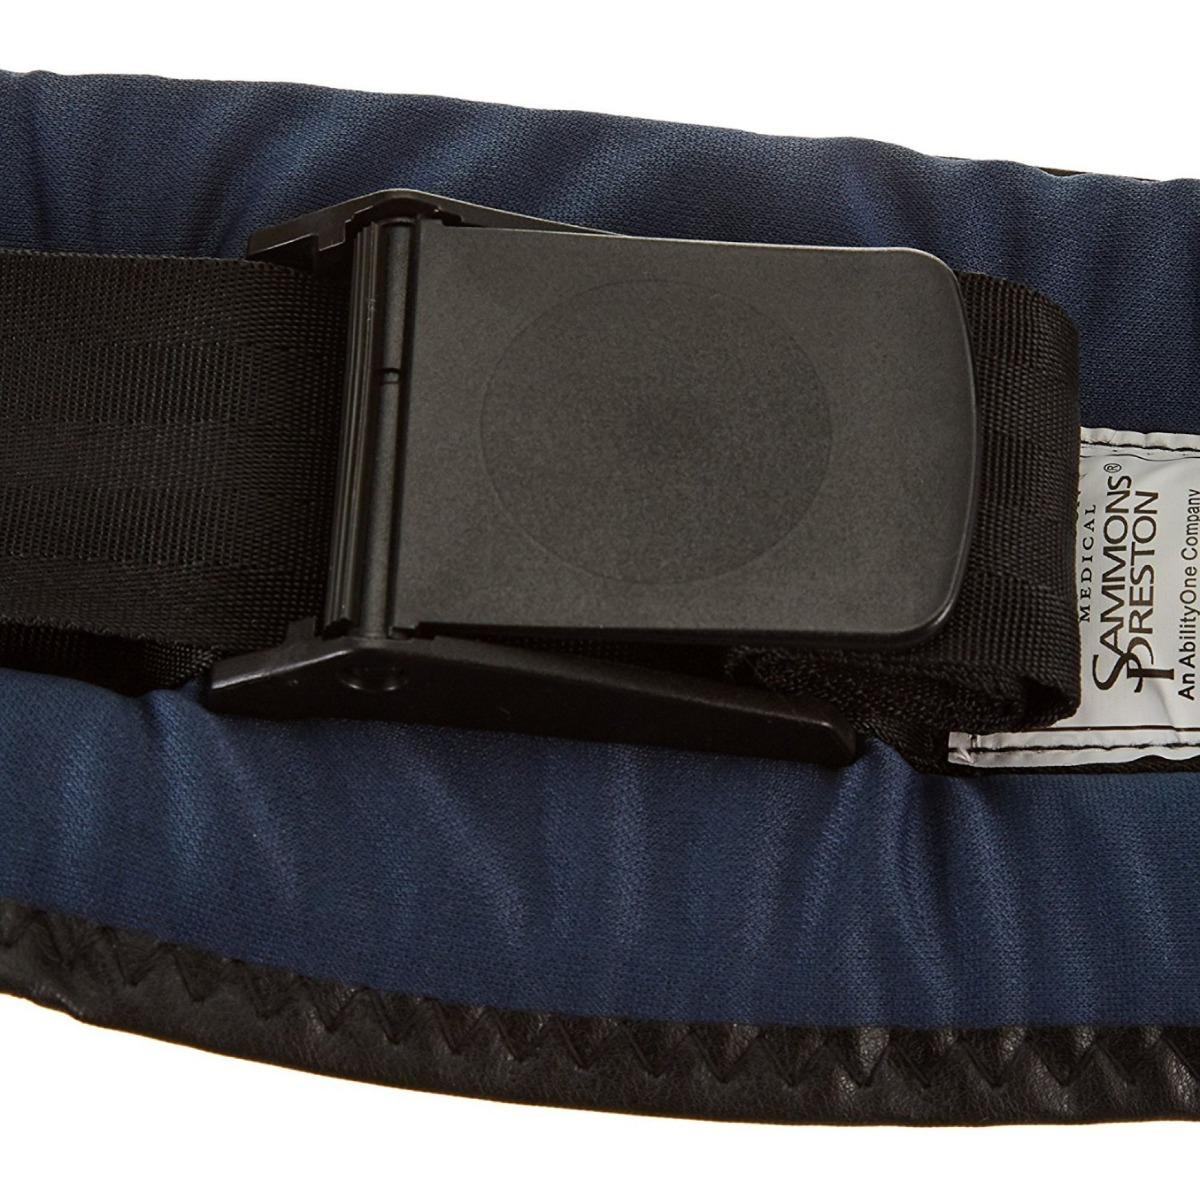 Sammons Preston Front-Release Padded Wheelchair Belt, Buckle Belt (cam lock)